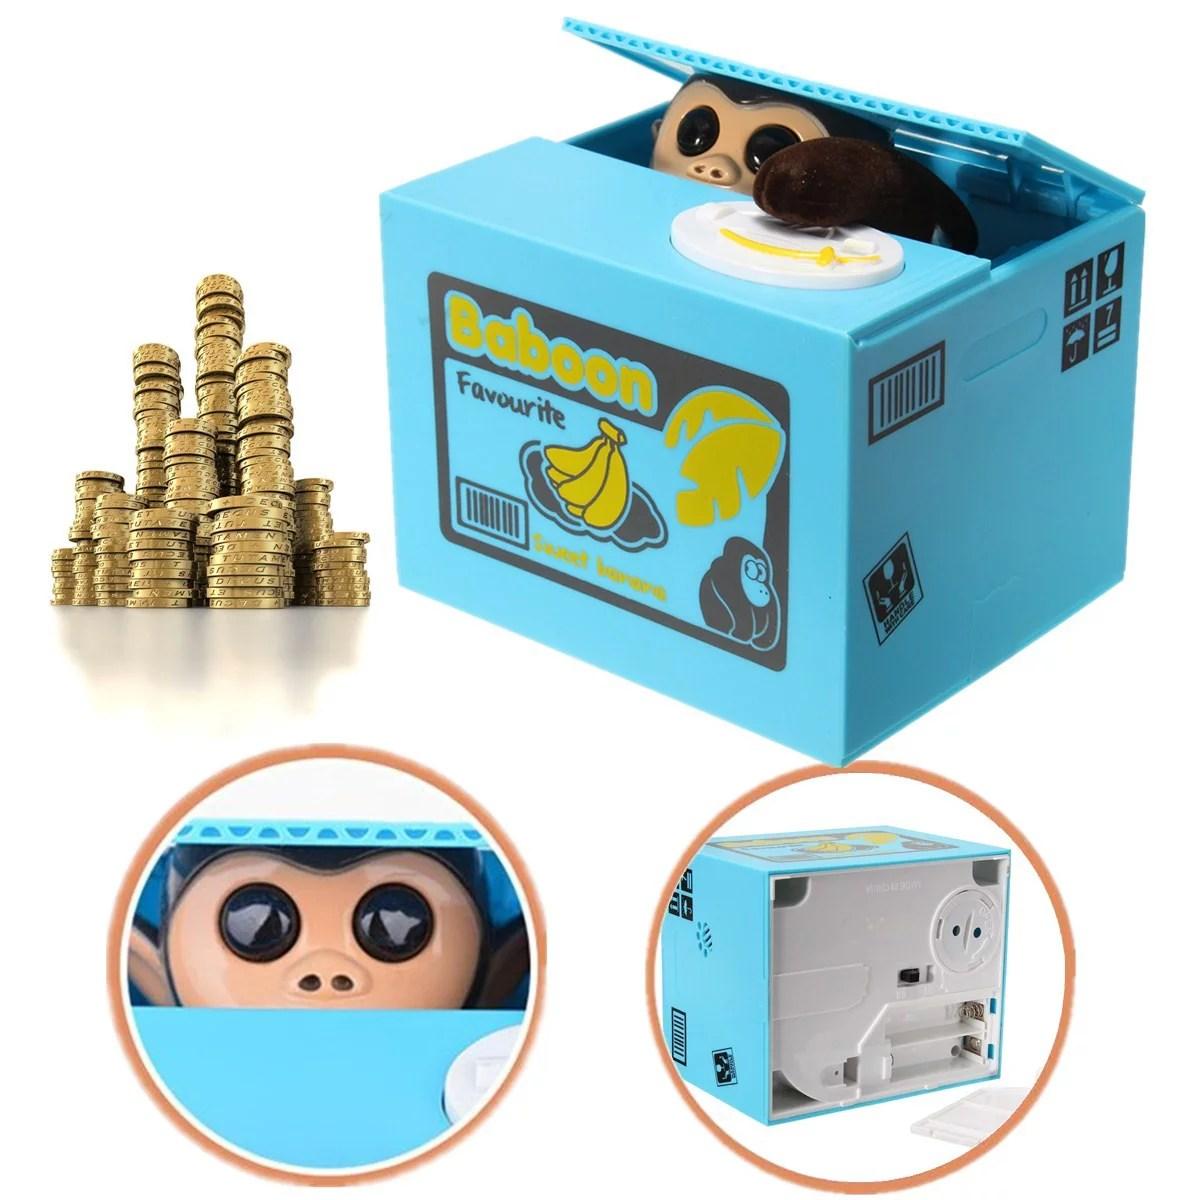 virtuous cute stealing money